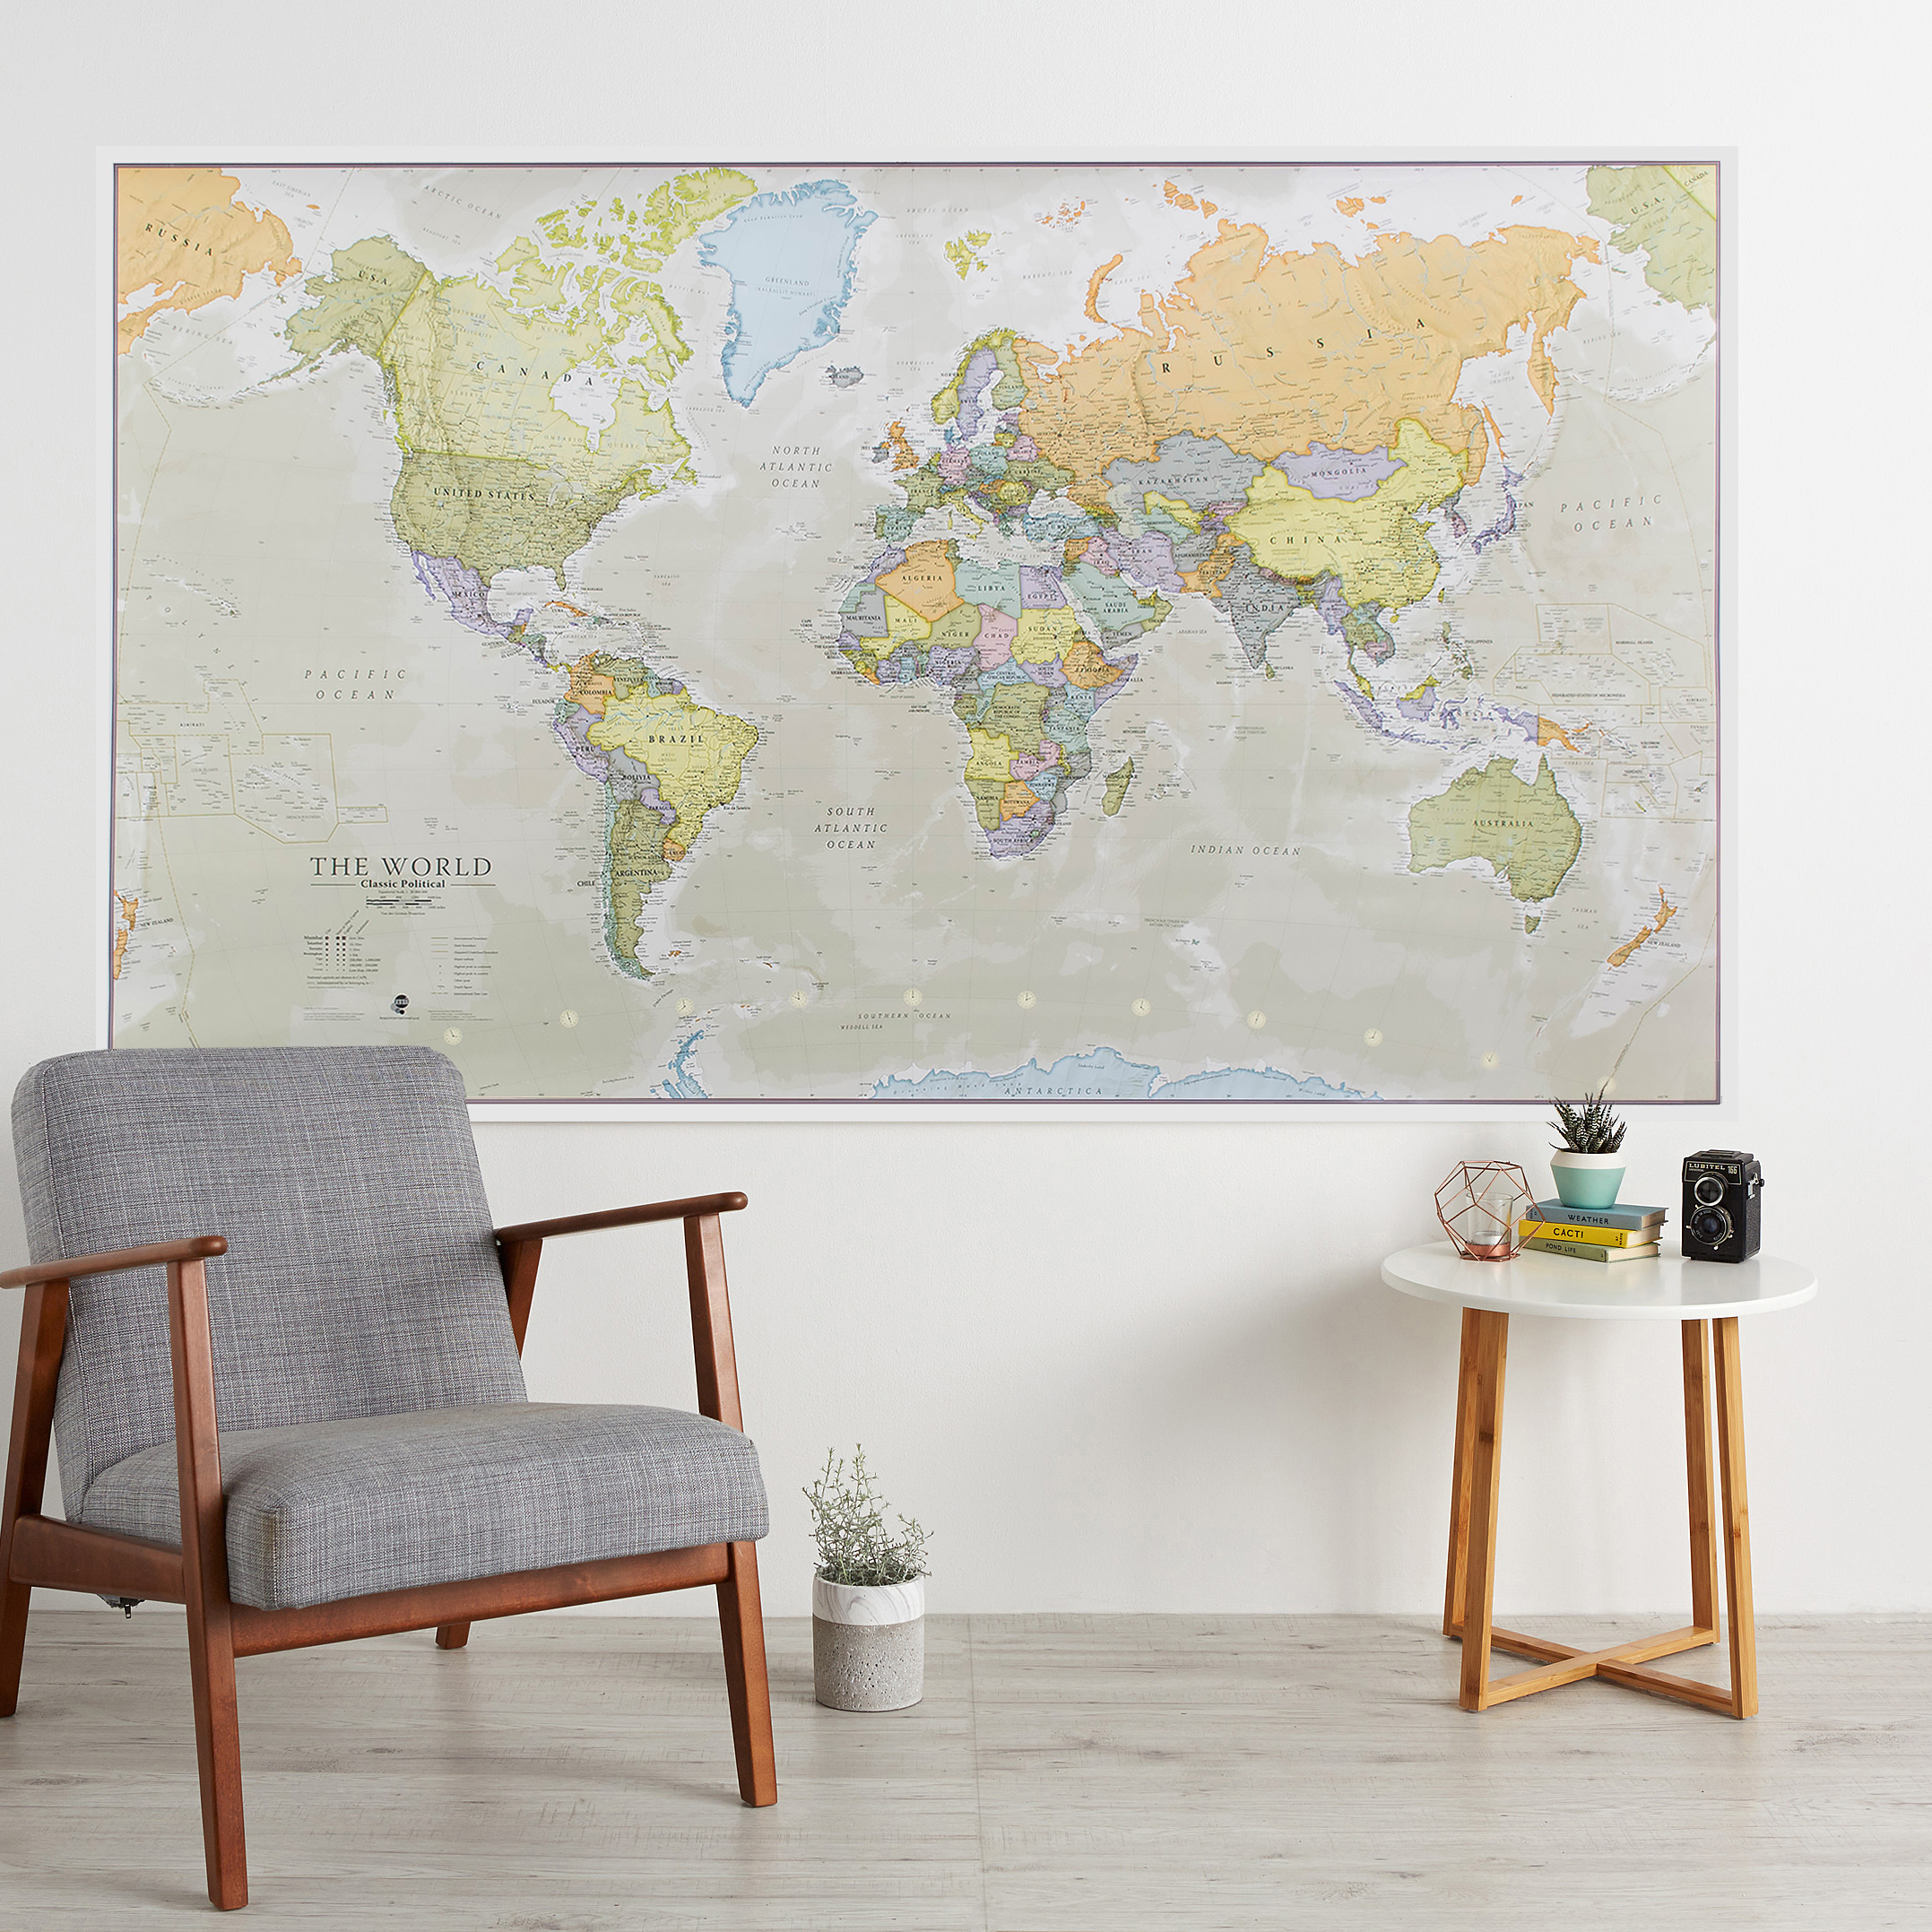 Maps International - The World Political - Huge